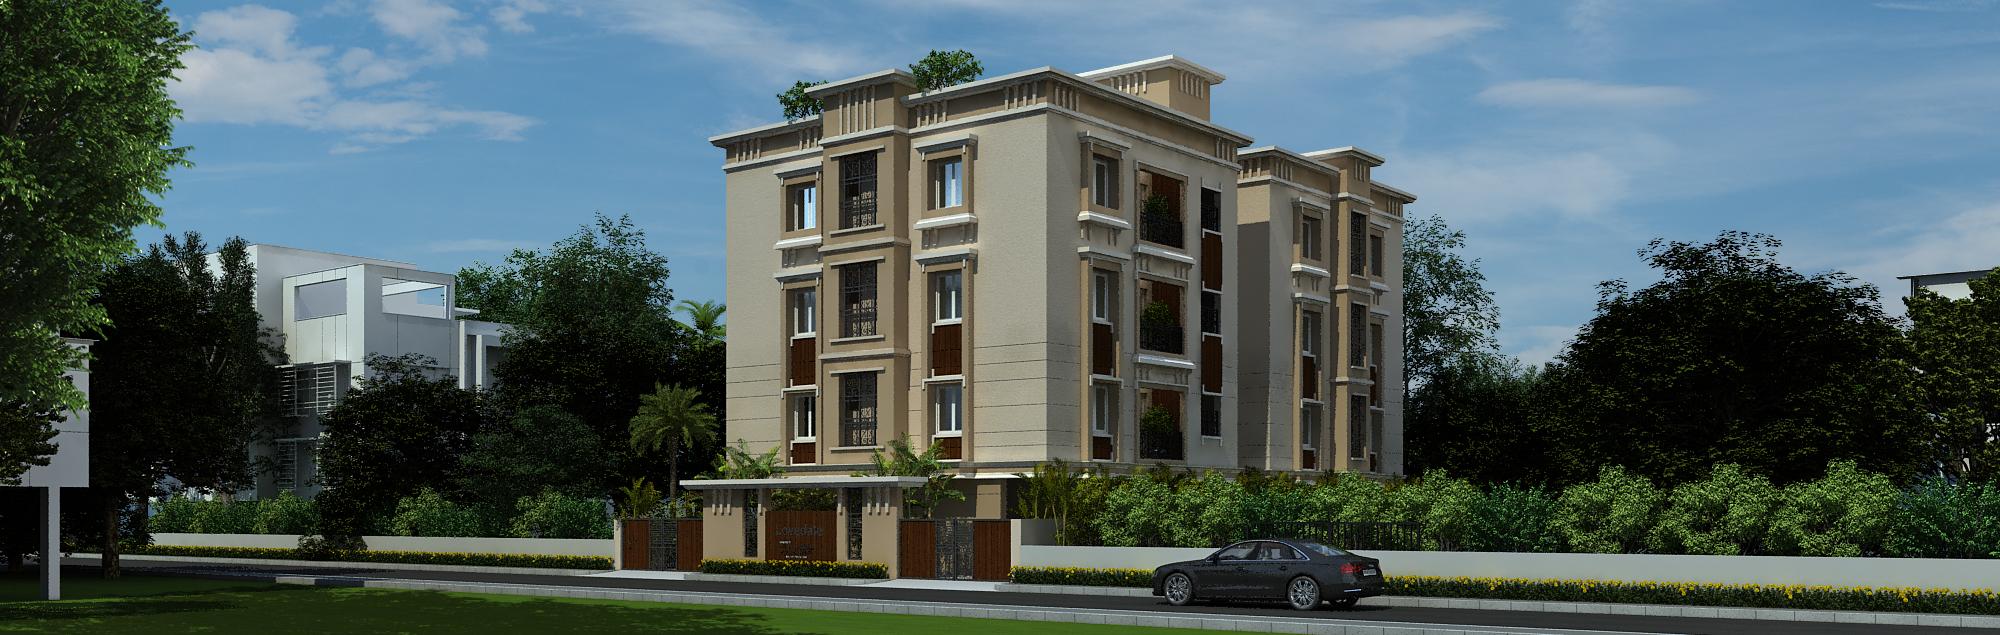 Premium Residential Apartments for Sale in Anna nagar, Adyar